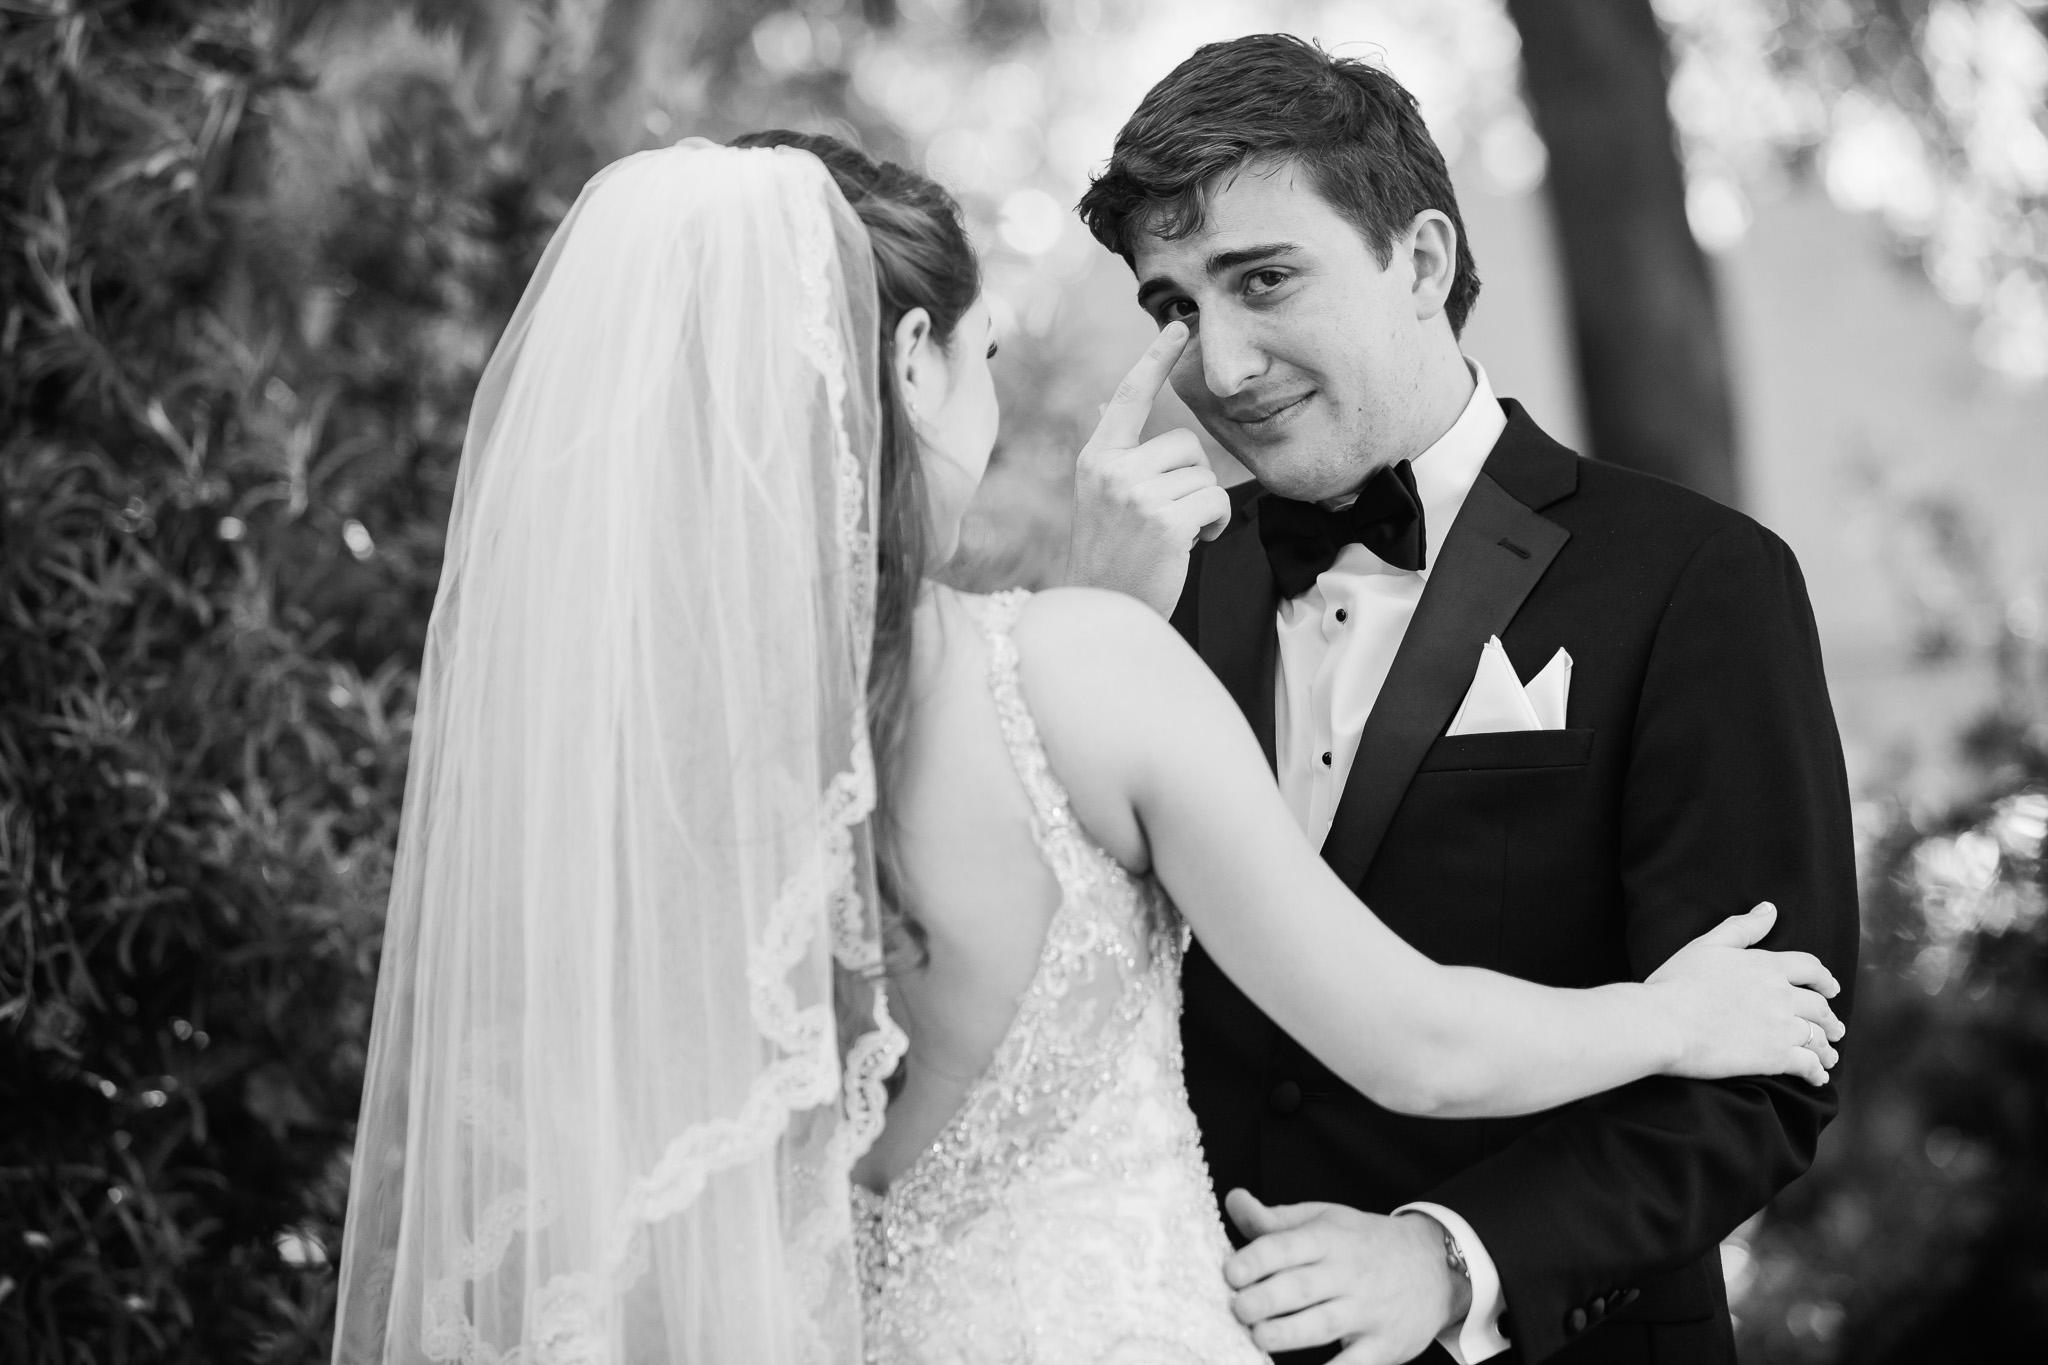 TAMPA_WEDDING_PHOTOGRAPHER_MPMZ_TJL46958_0039.jpg